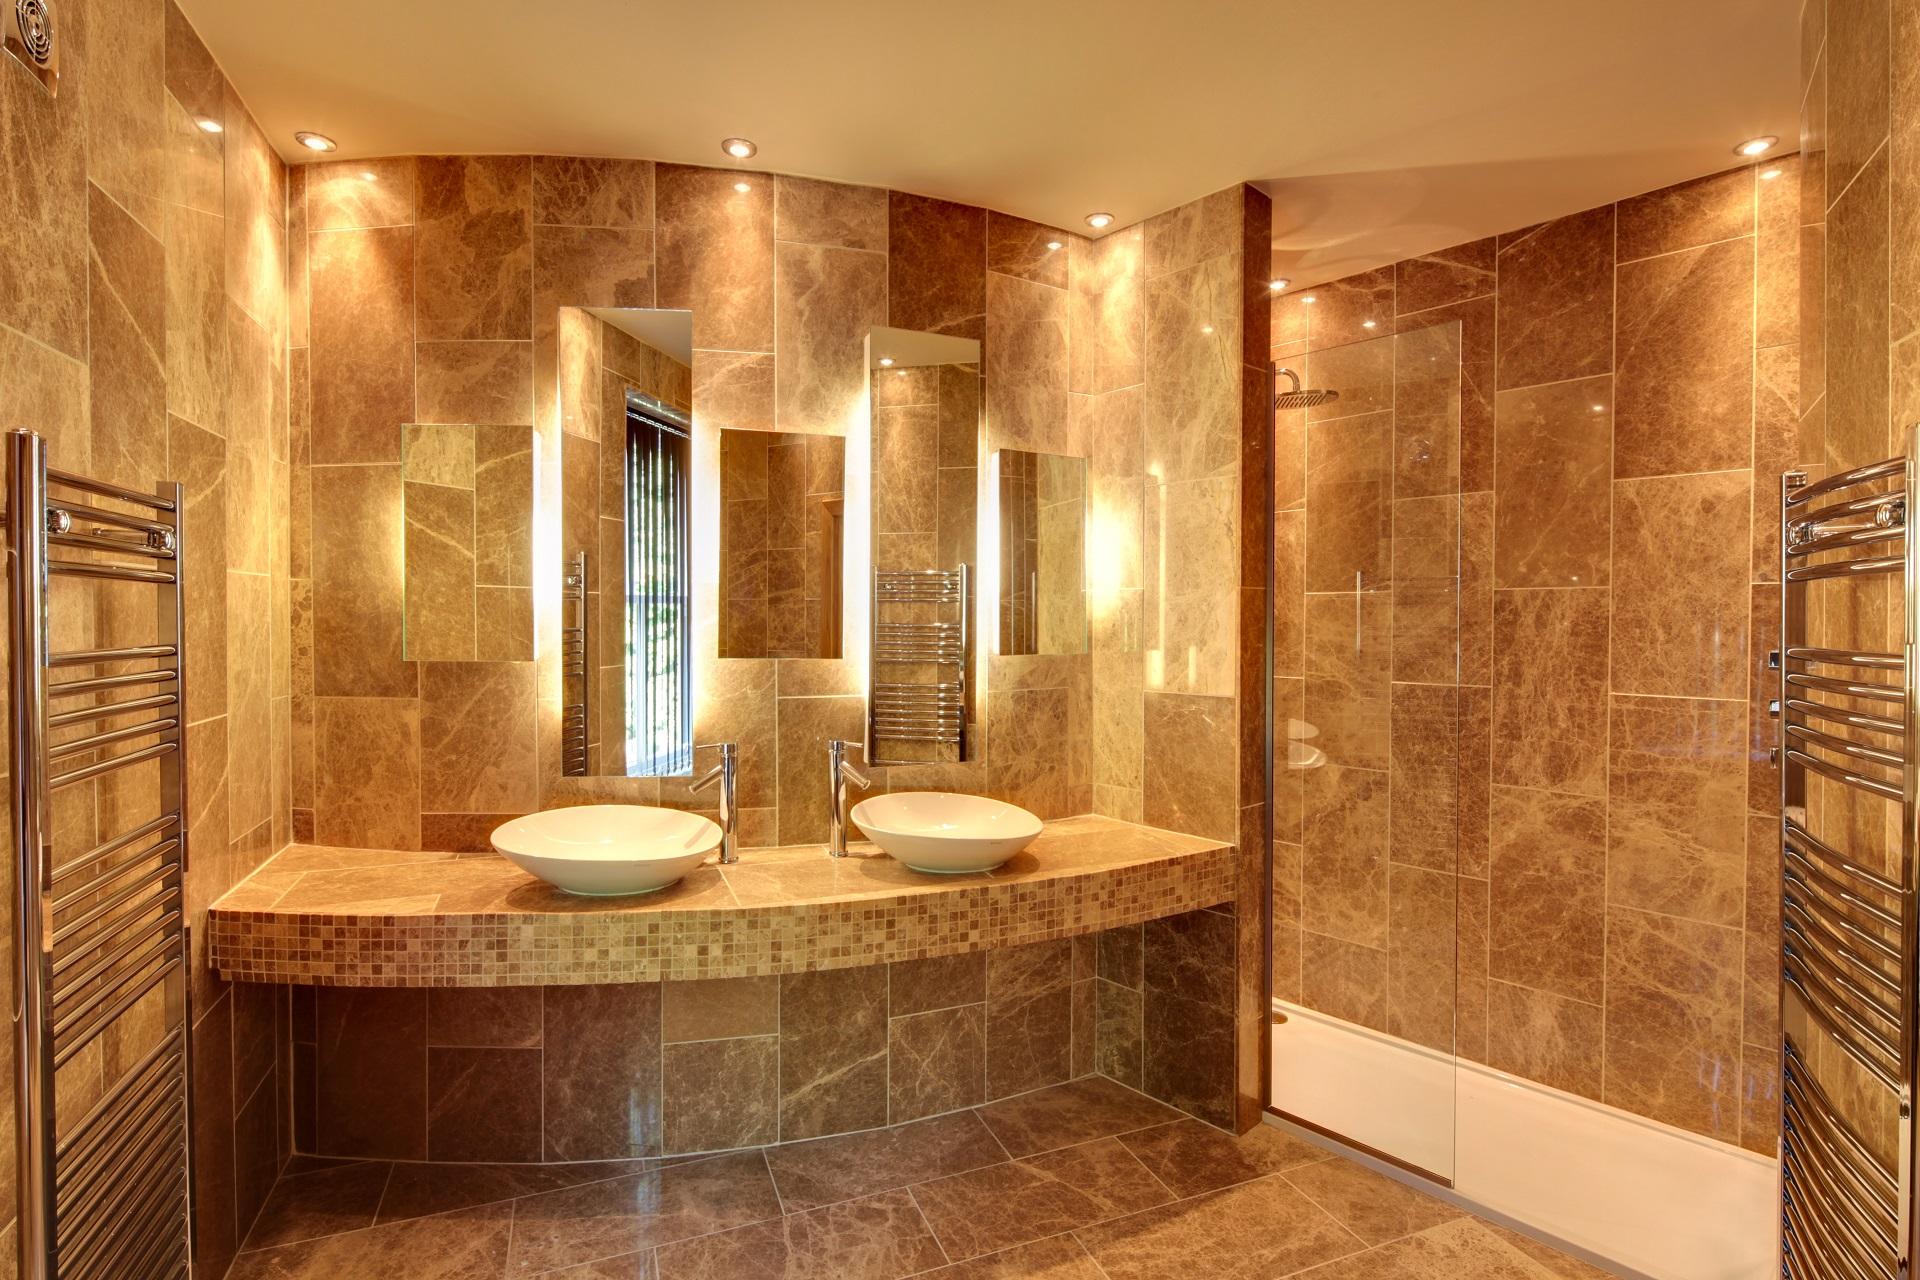 Marble bathroom suite, Hall View luxury development by Guy Phoenix